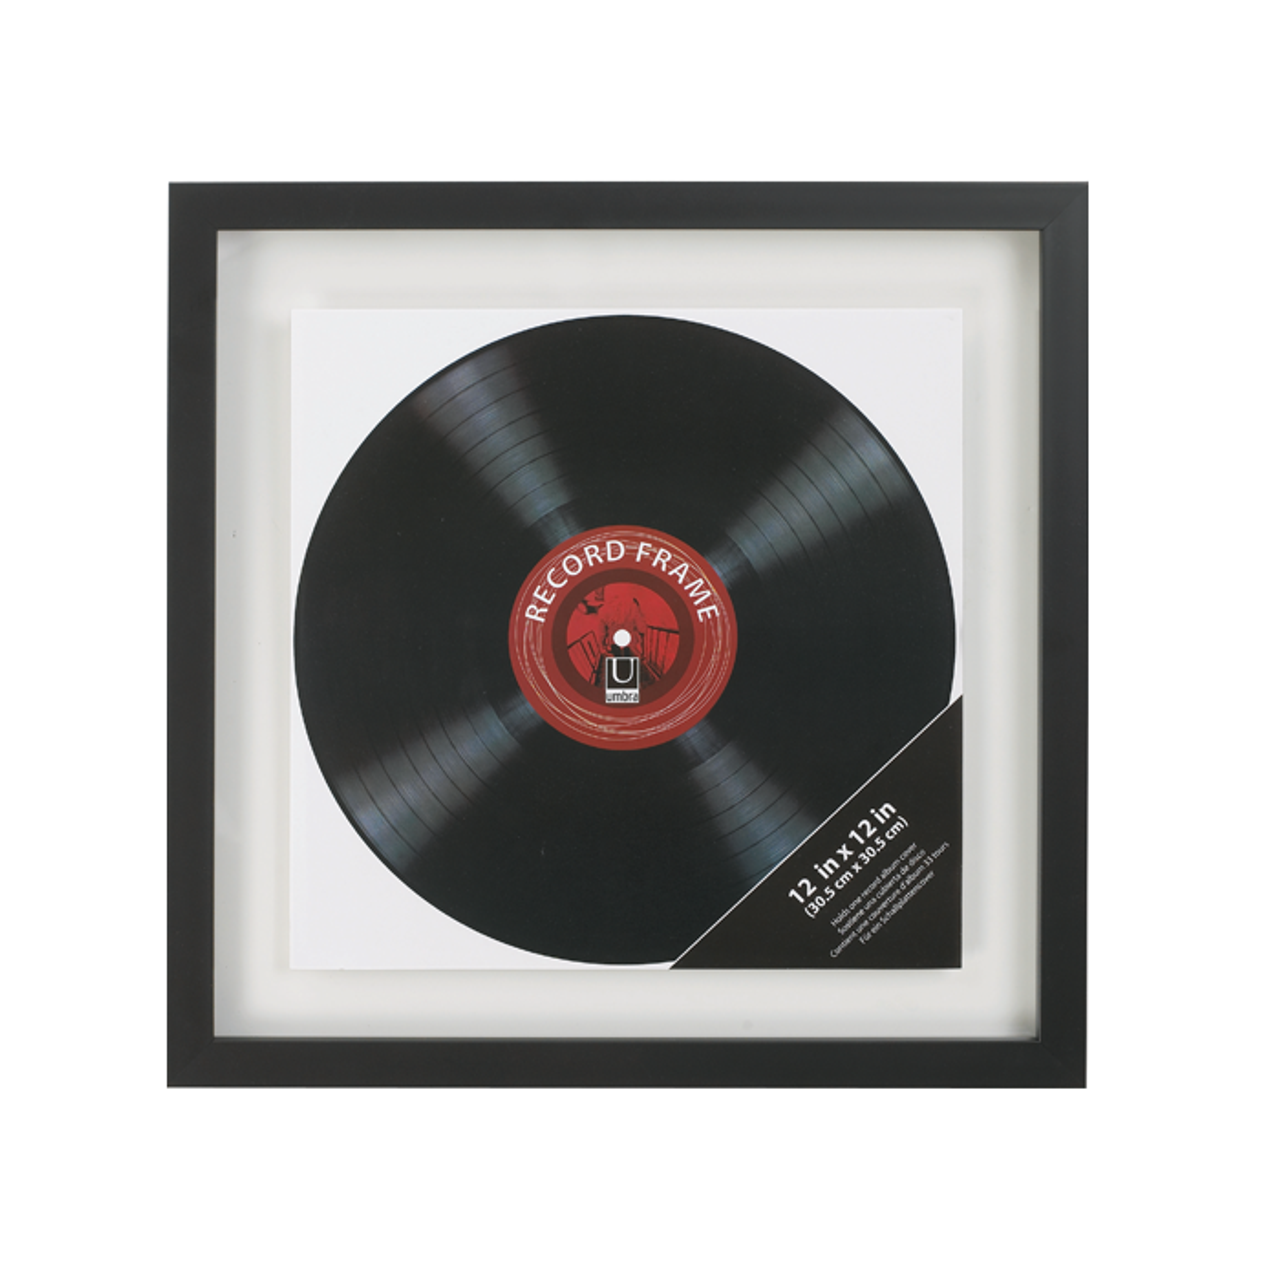 cd4468e40dfc Record Frame 12x12